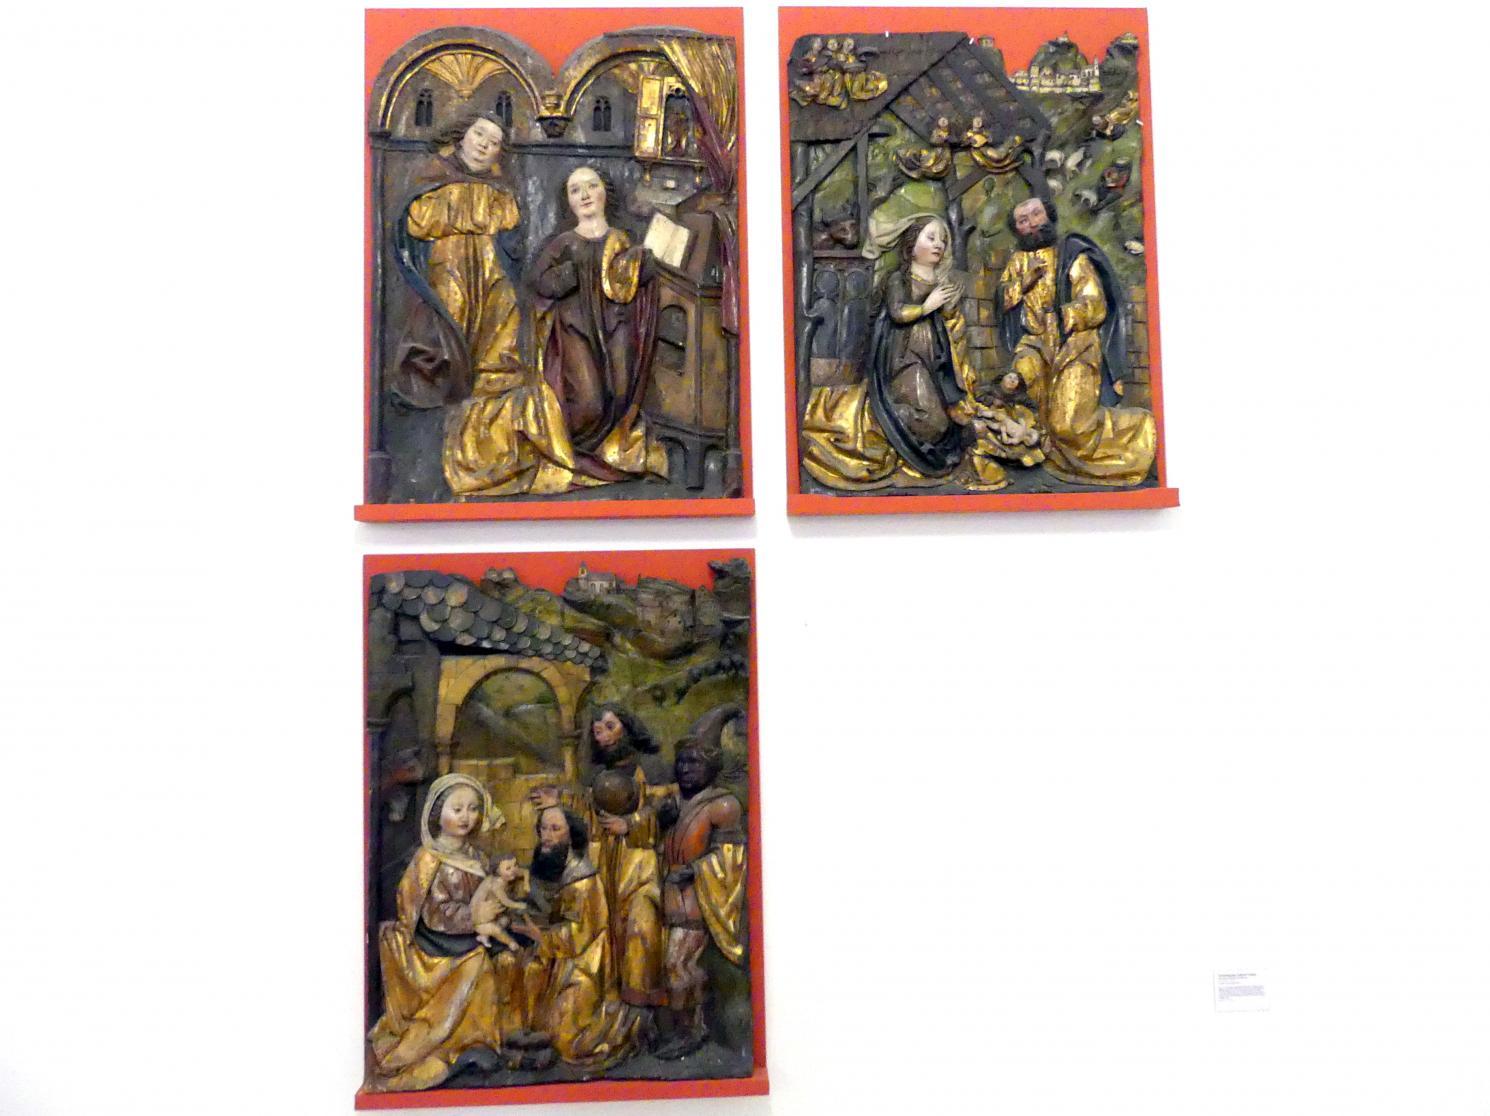 Verkündigung, Geburt Christi, Anbetung der Könige, Tod Mariens, um 1500